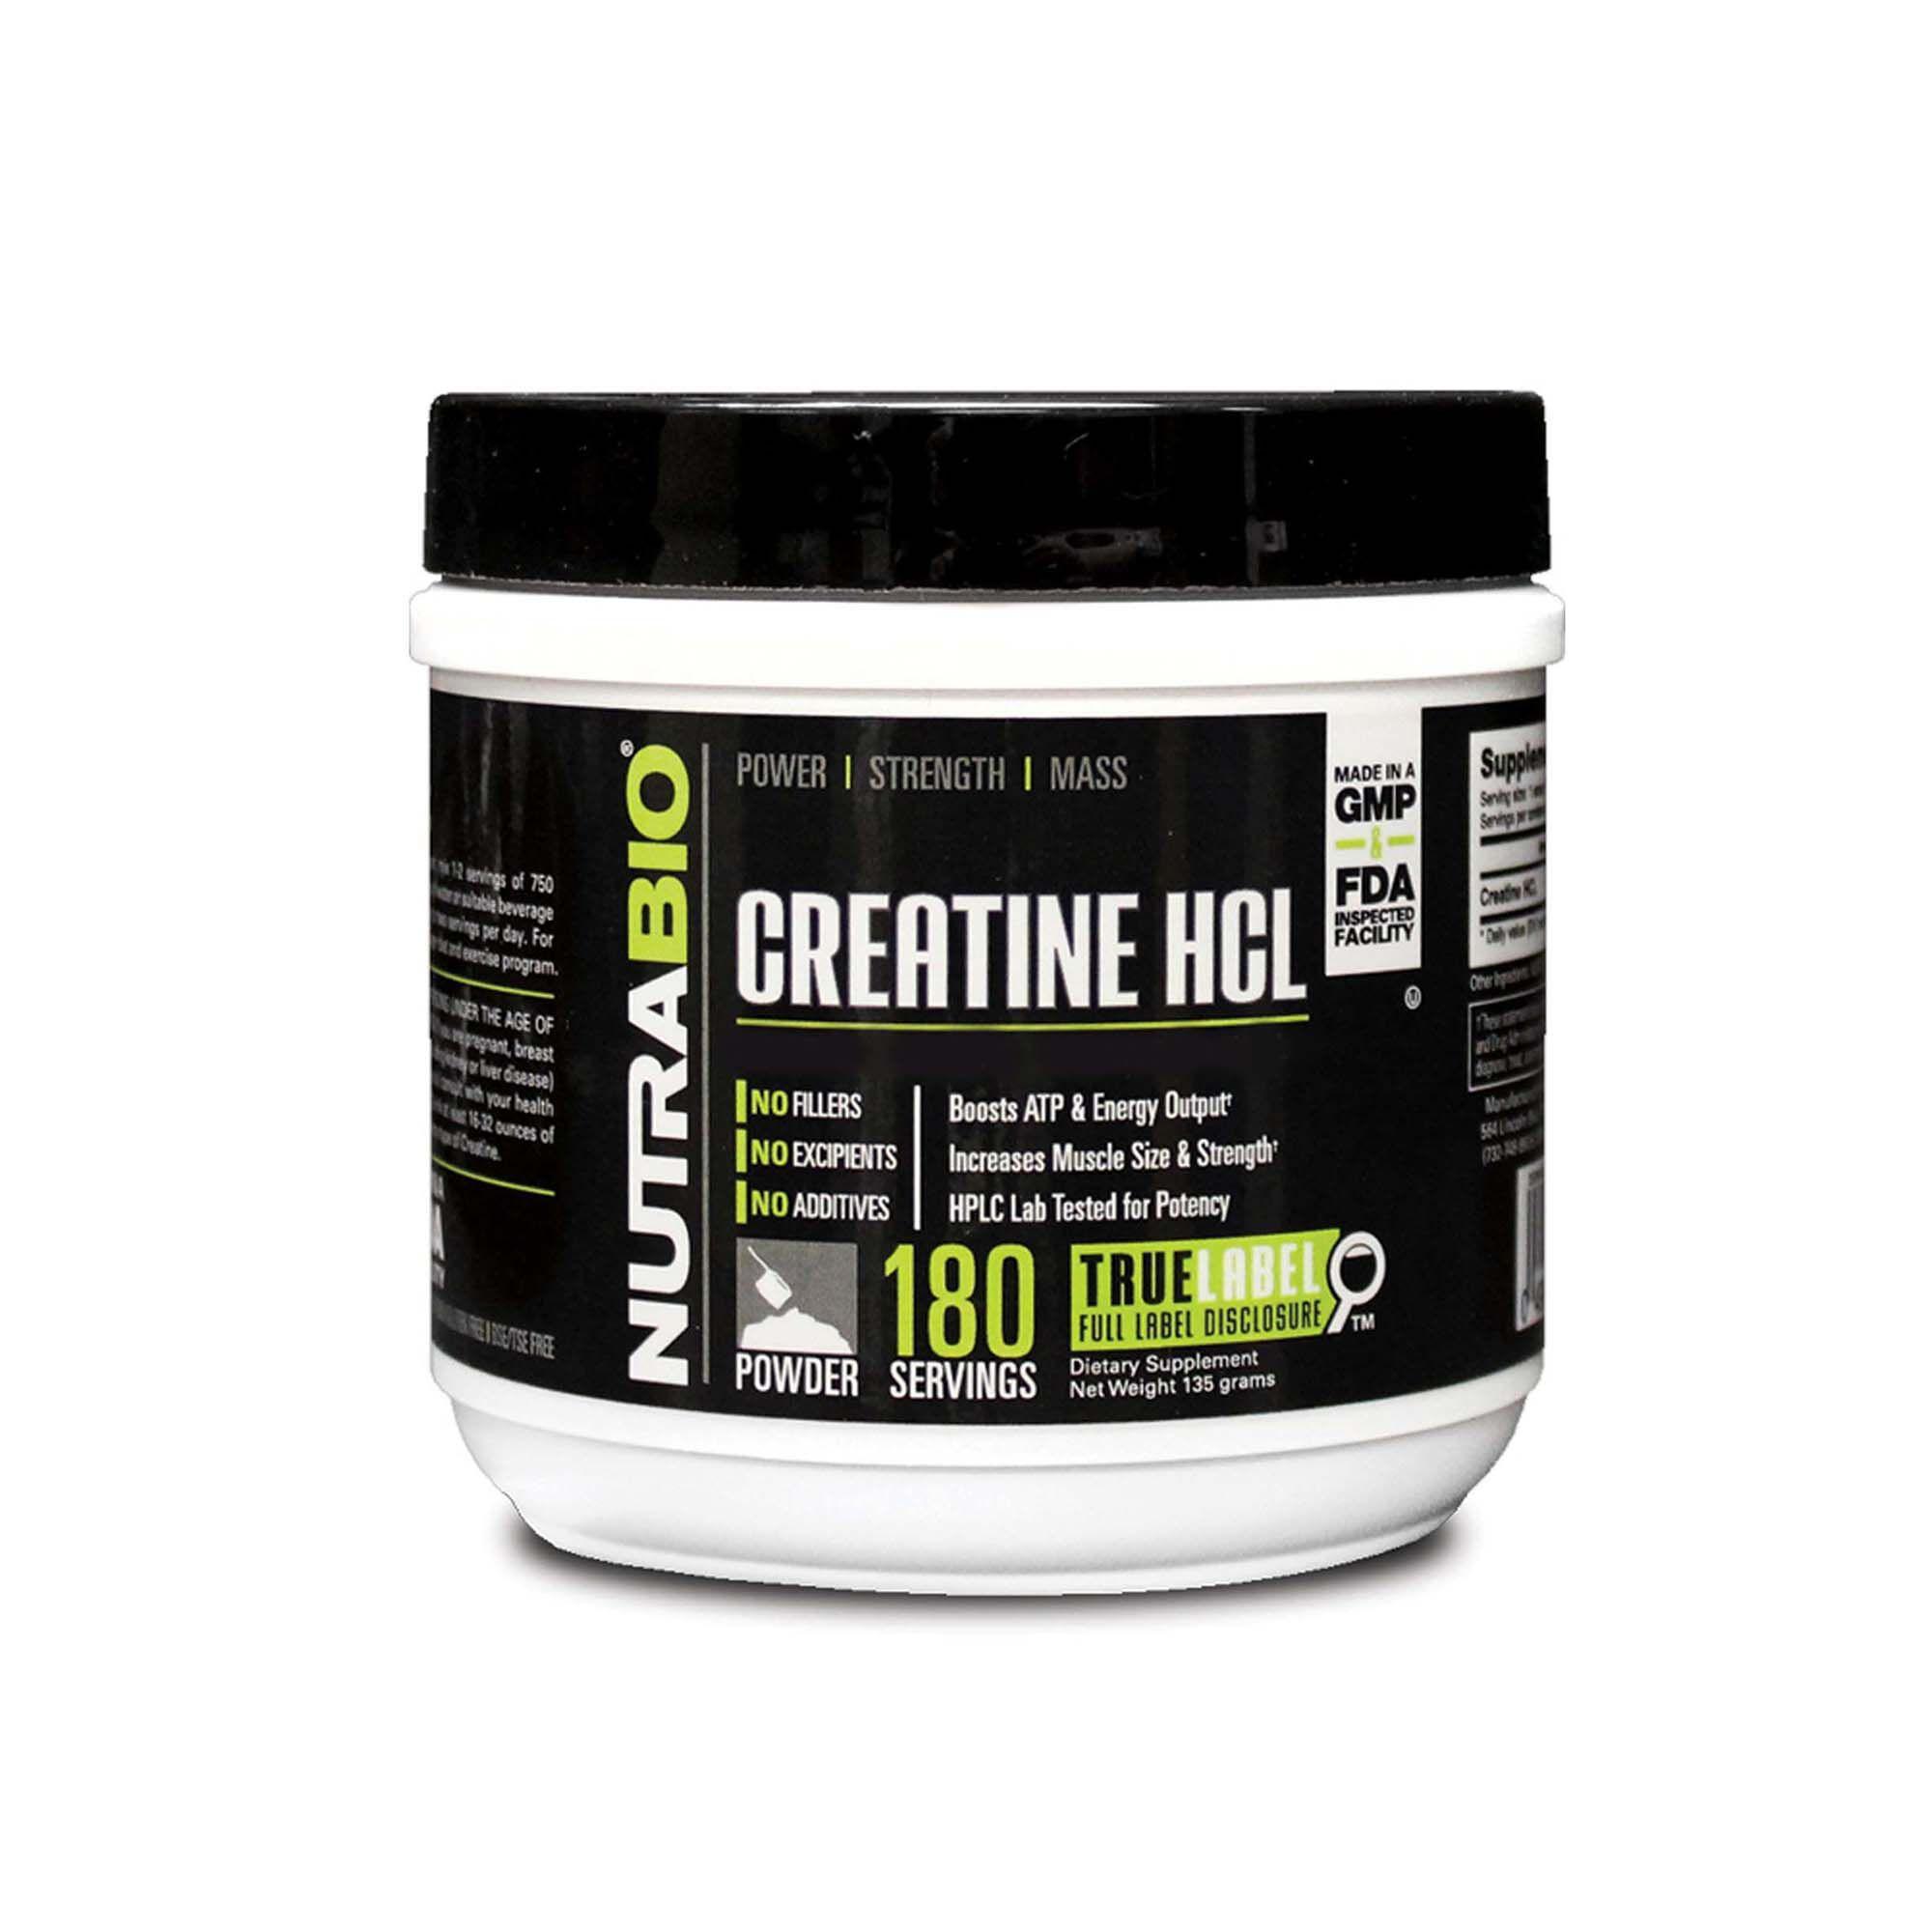 Creatine Hcl - 180 Servings - Nutrabio - Creatine